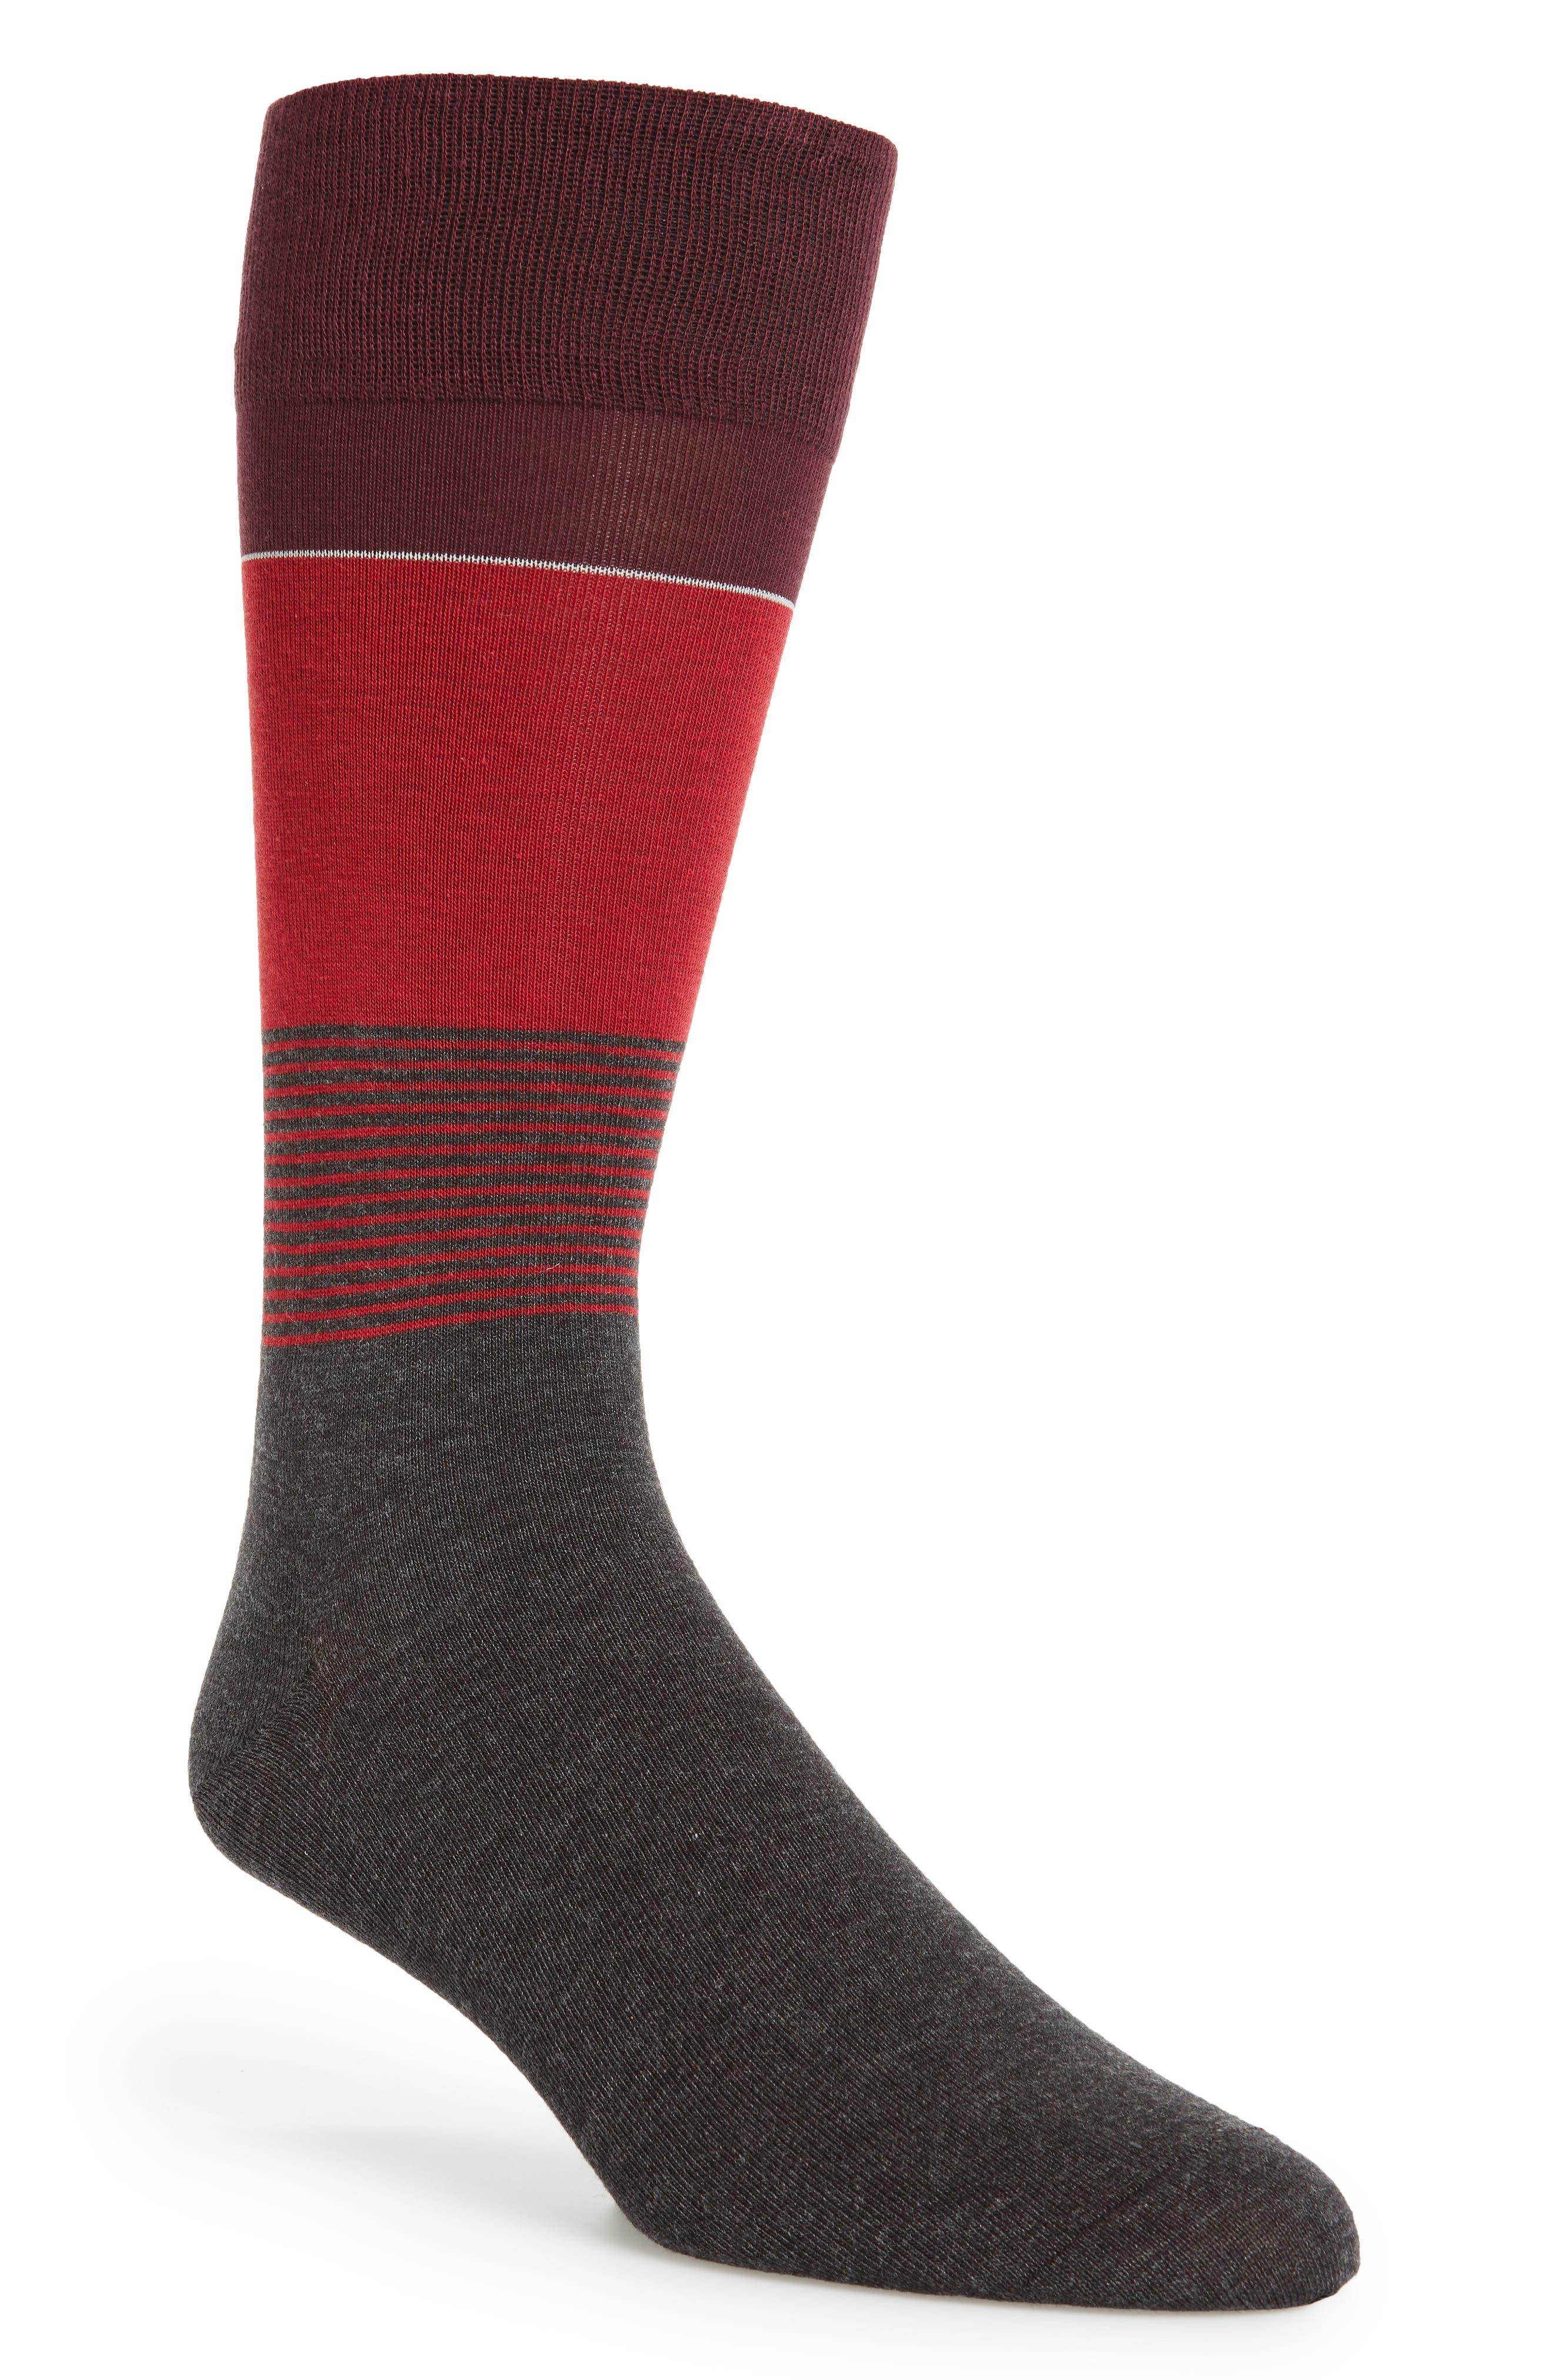 Stripe Socks,                             Main thumbnail 1, color,                             Graphite Heather/ Red